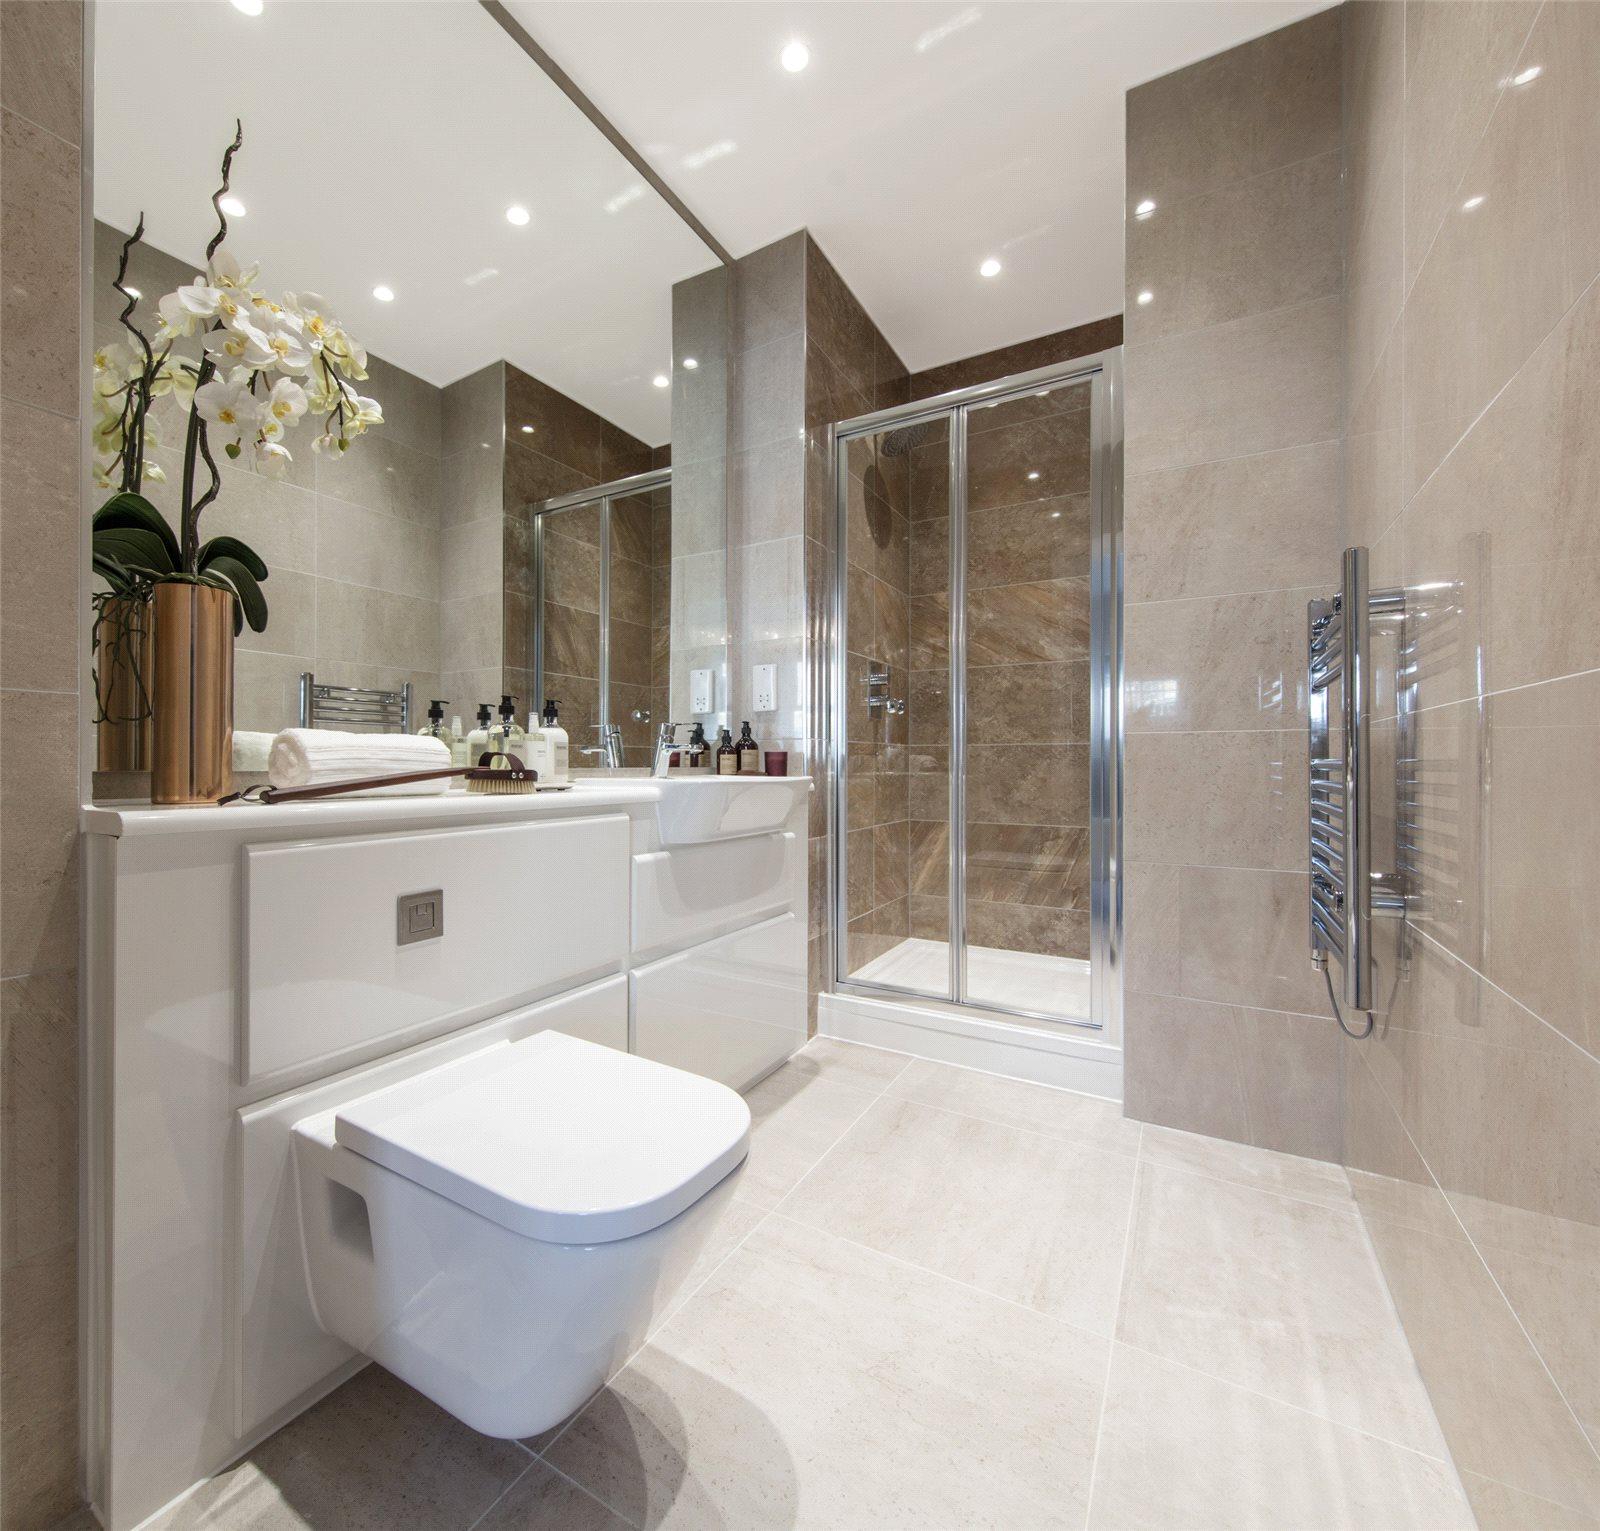 Prime Place,Bathroom